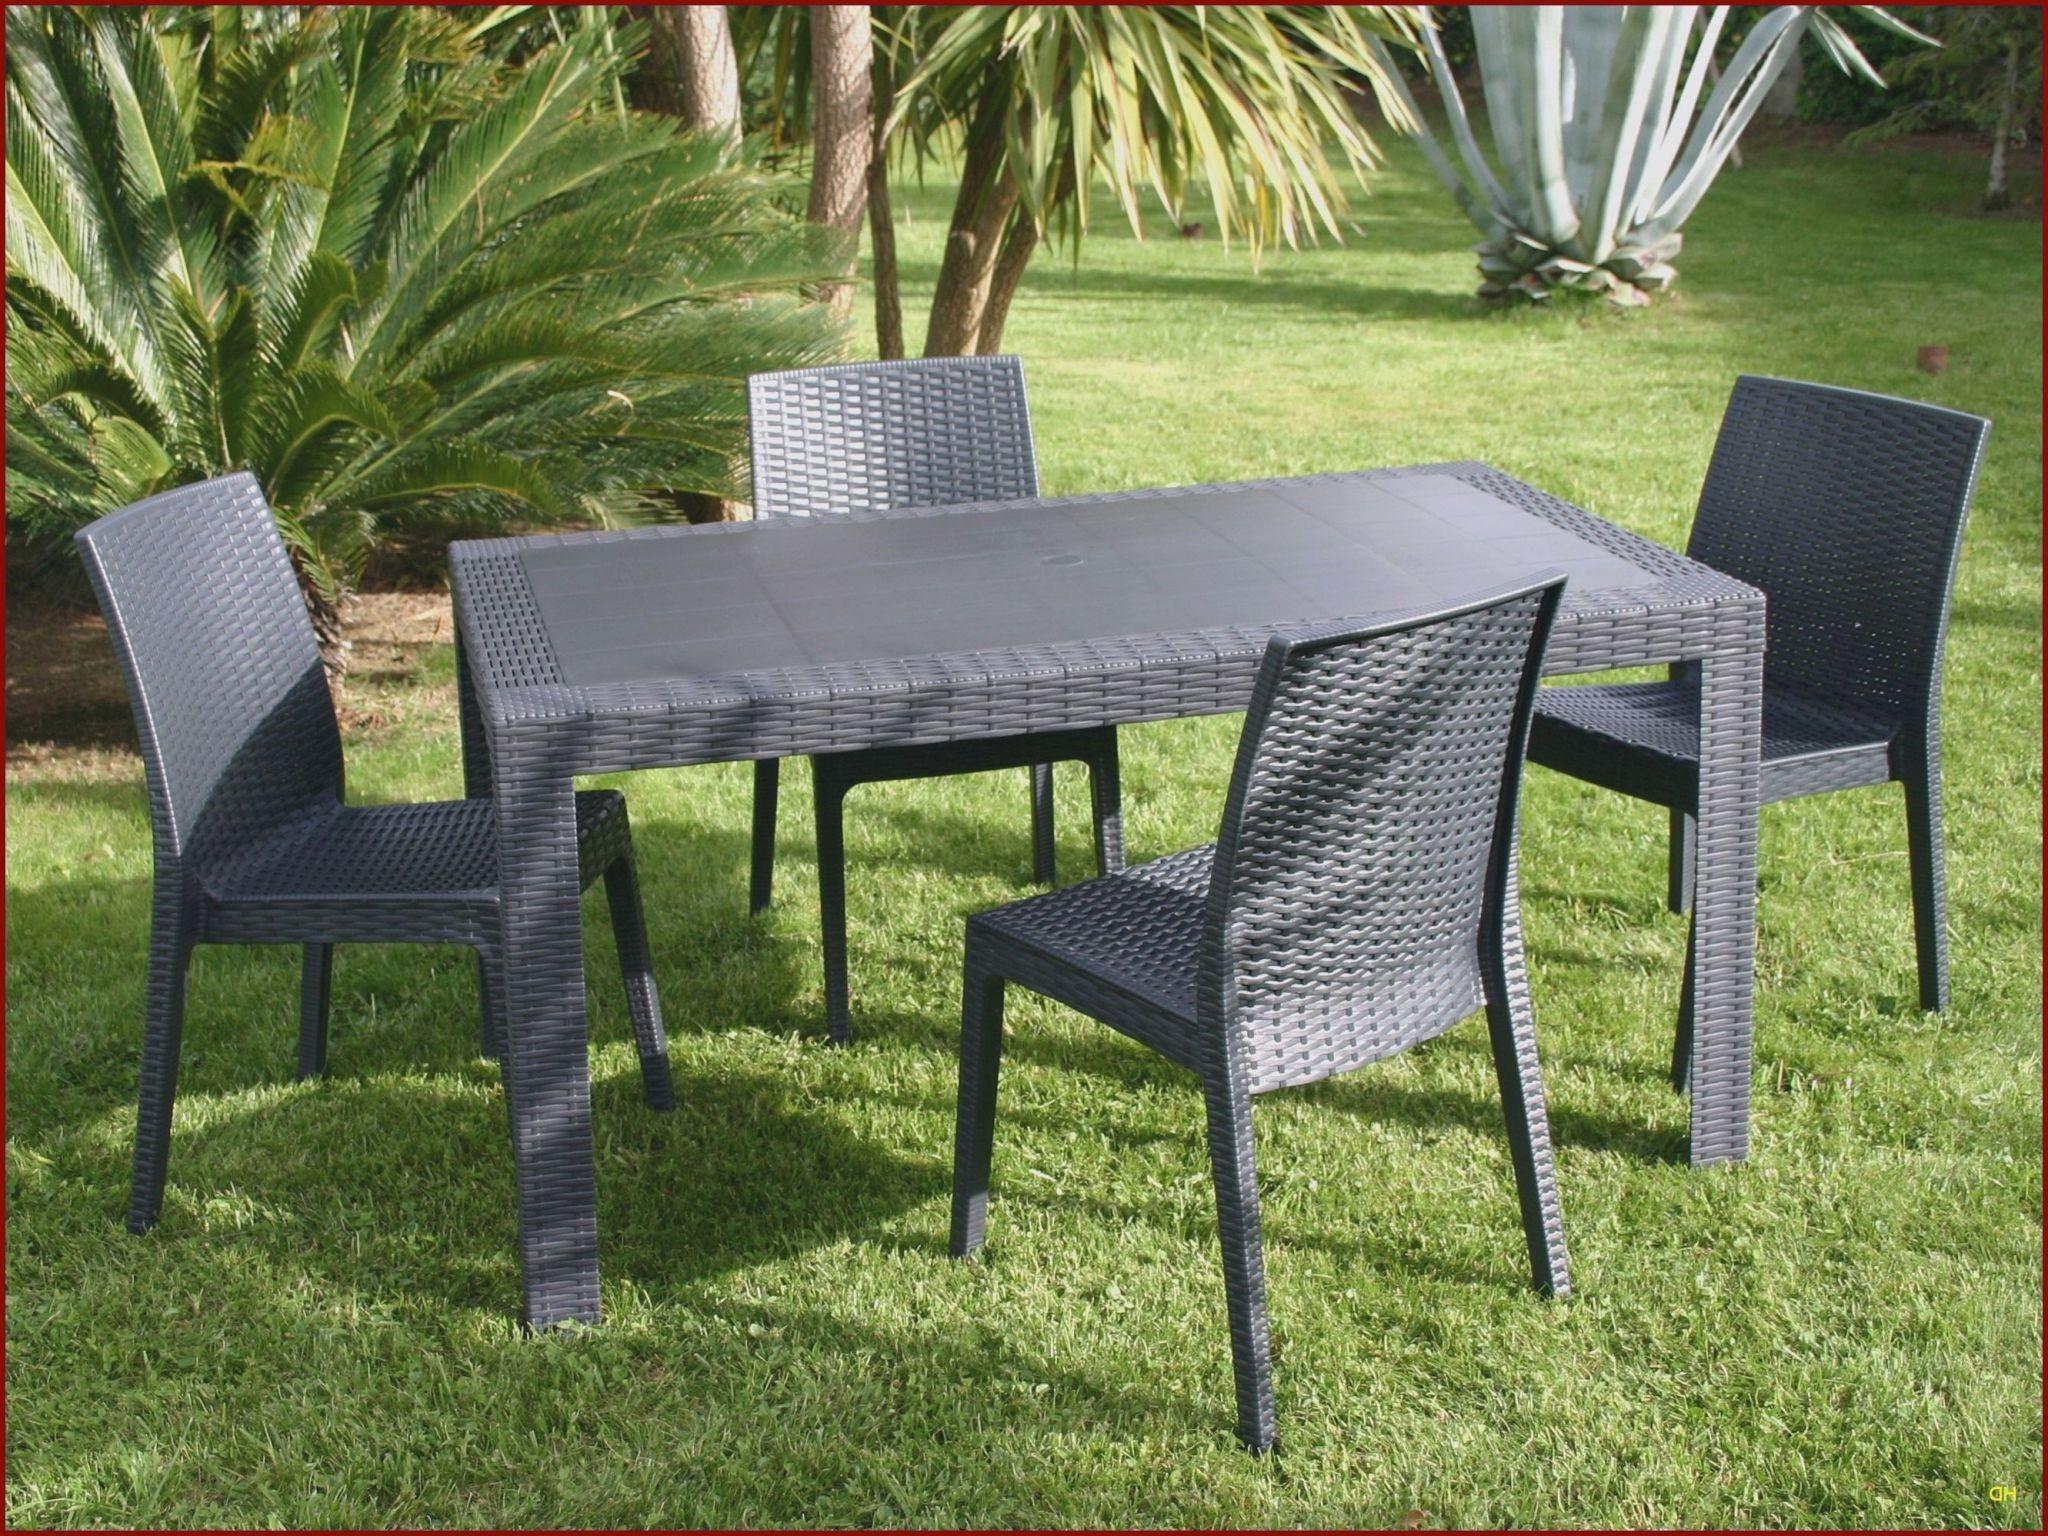 salon de jardin resine ronde best of chaises luxe chaise ice 0d table jardin resine lovely of salon de jardin resine ronde